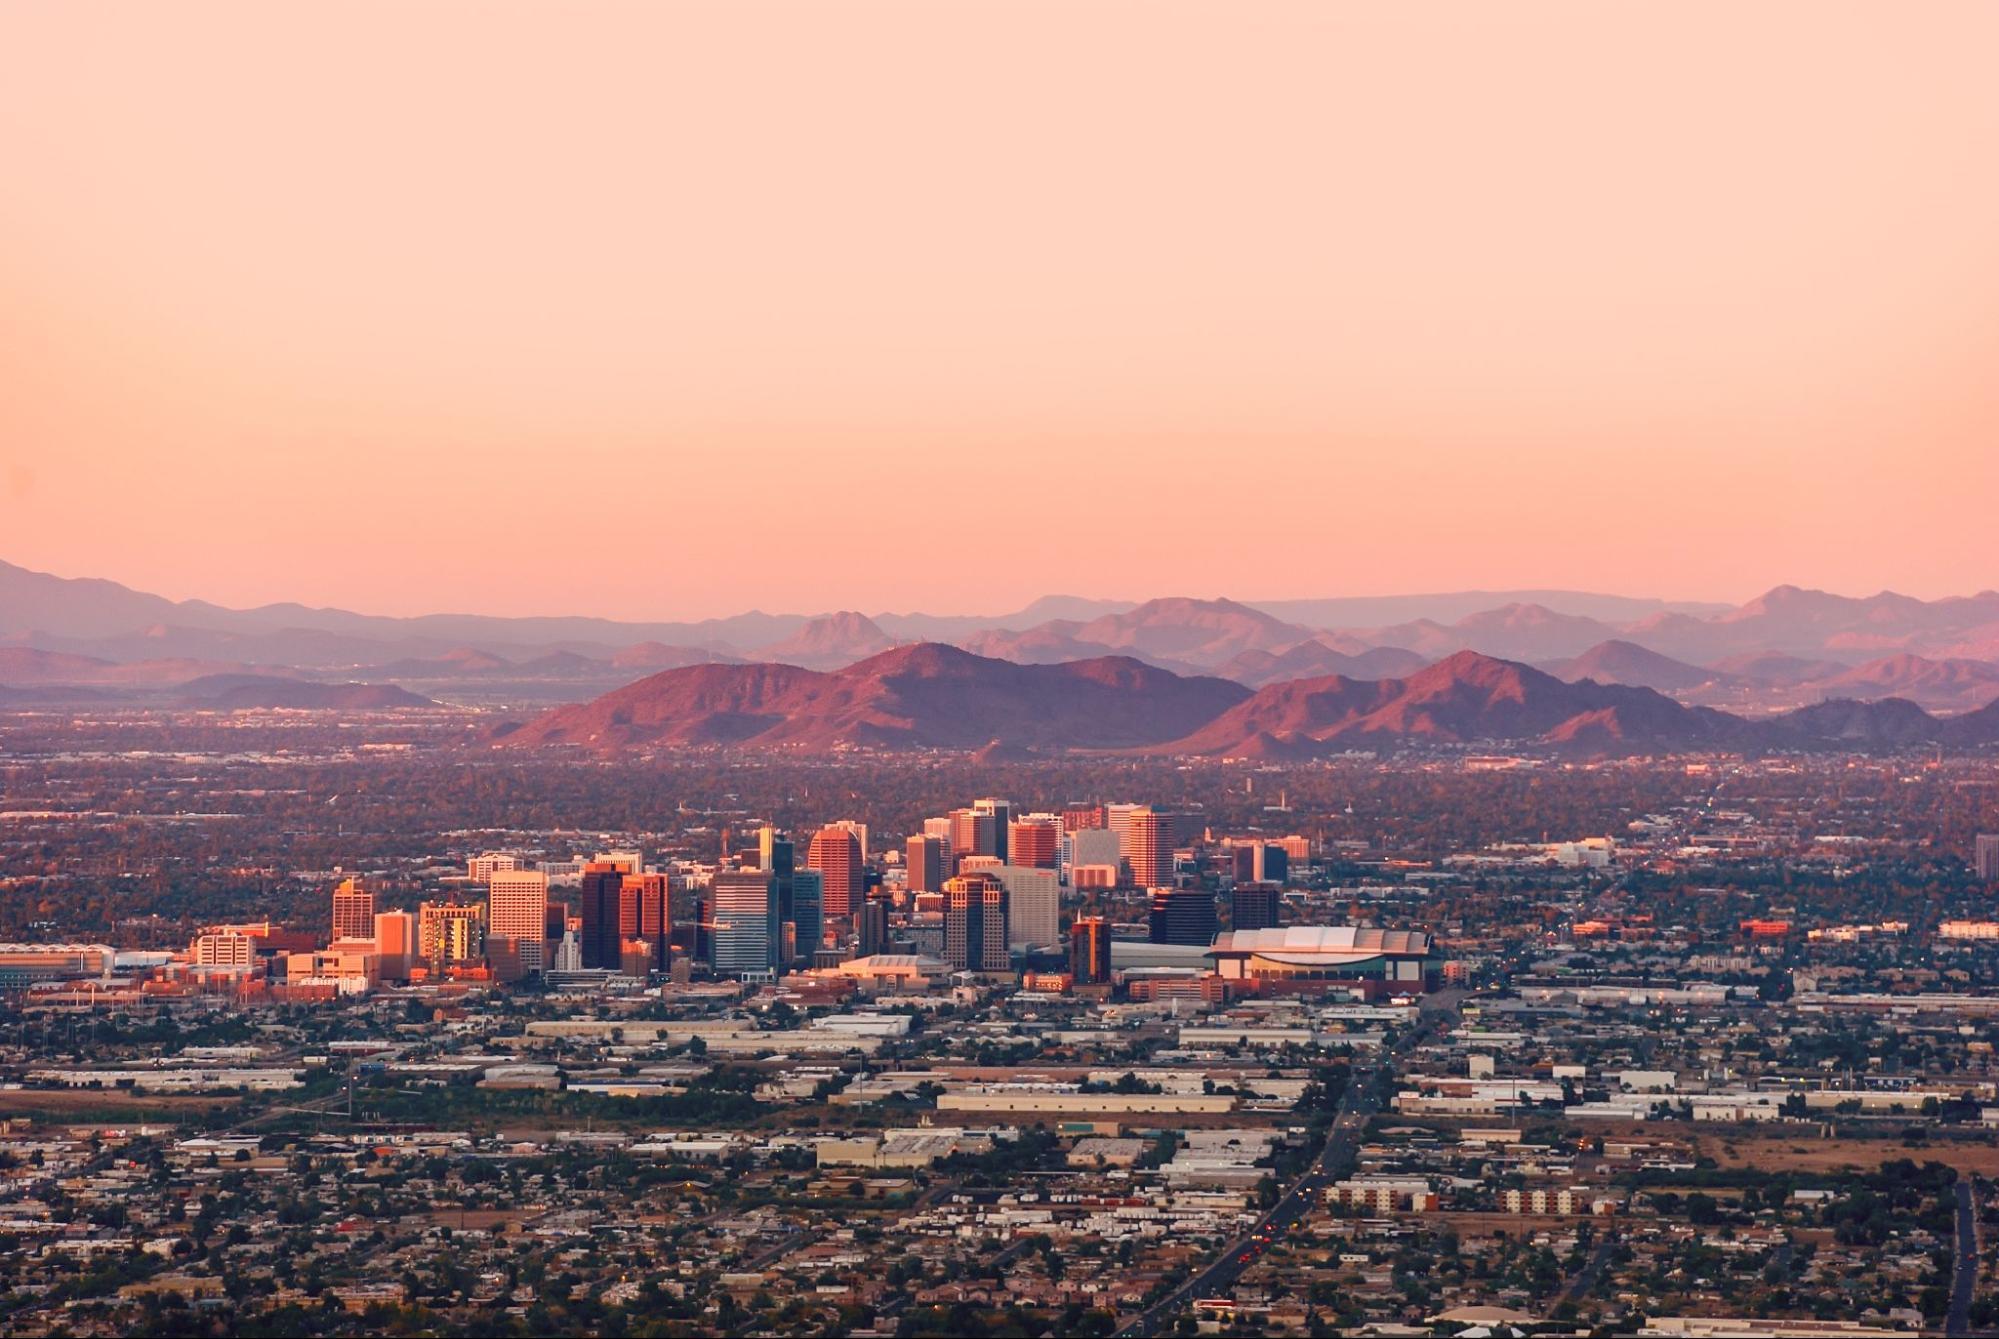 View of skyline in Phoenix, Arizona